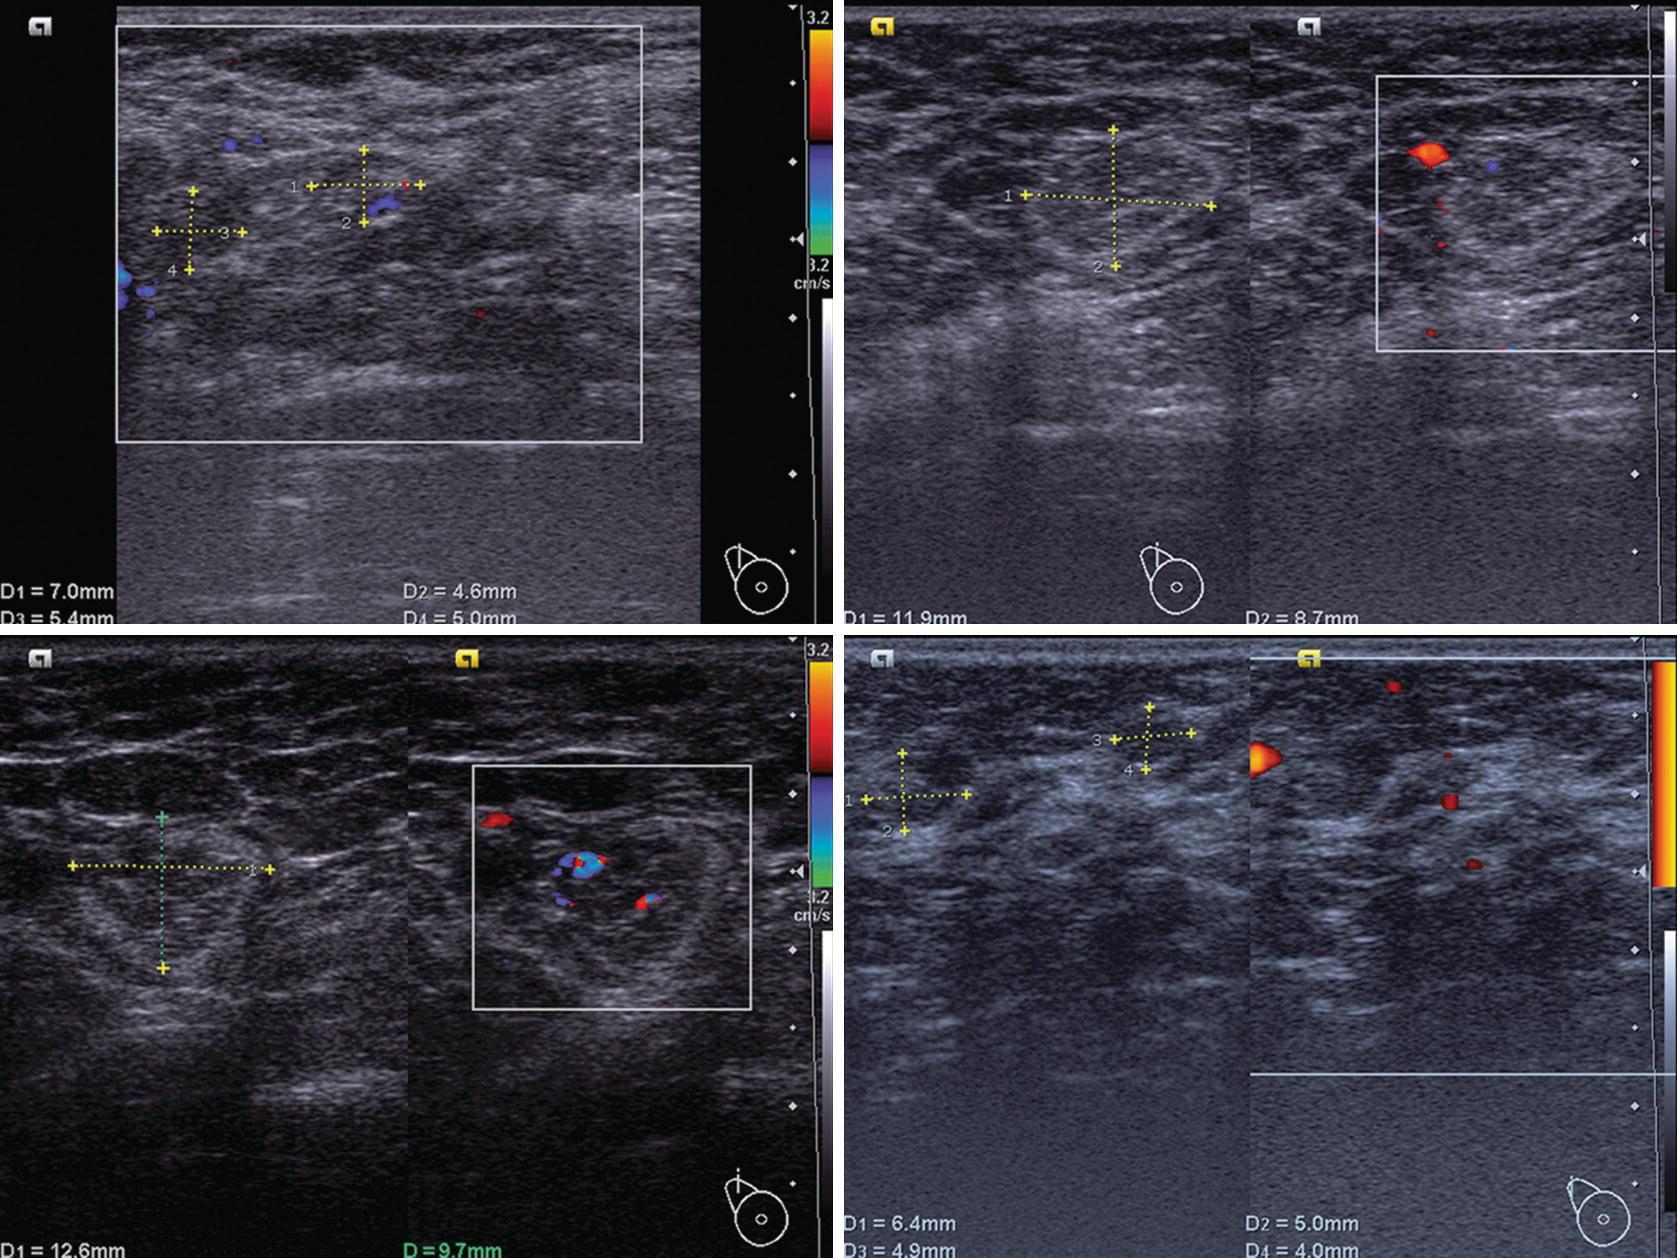 Ultrasound of Regional Lymph Nodes in Breast Cancer